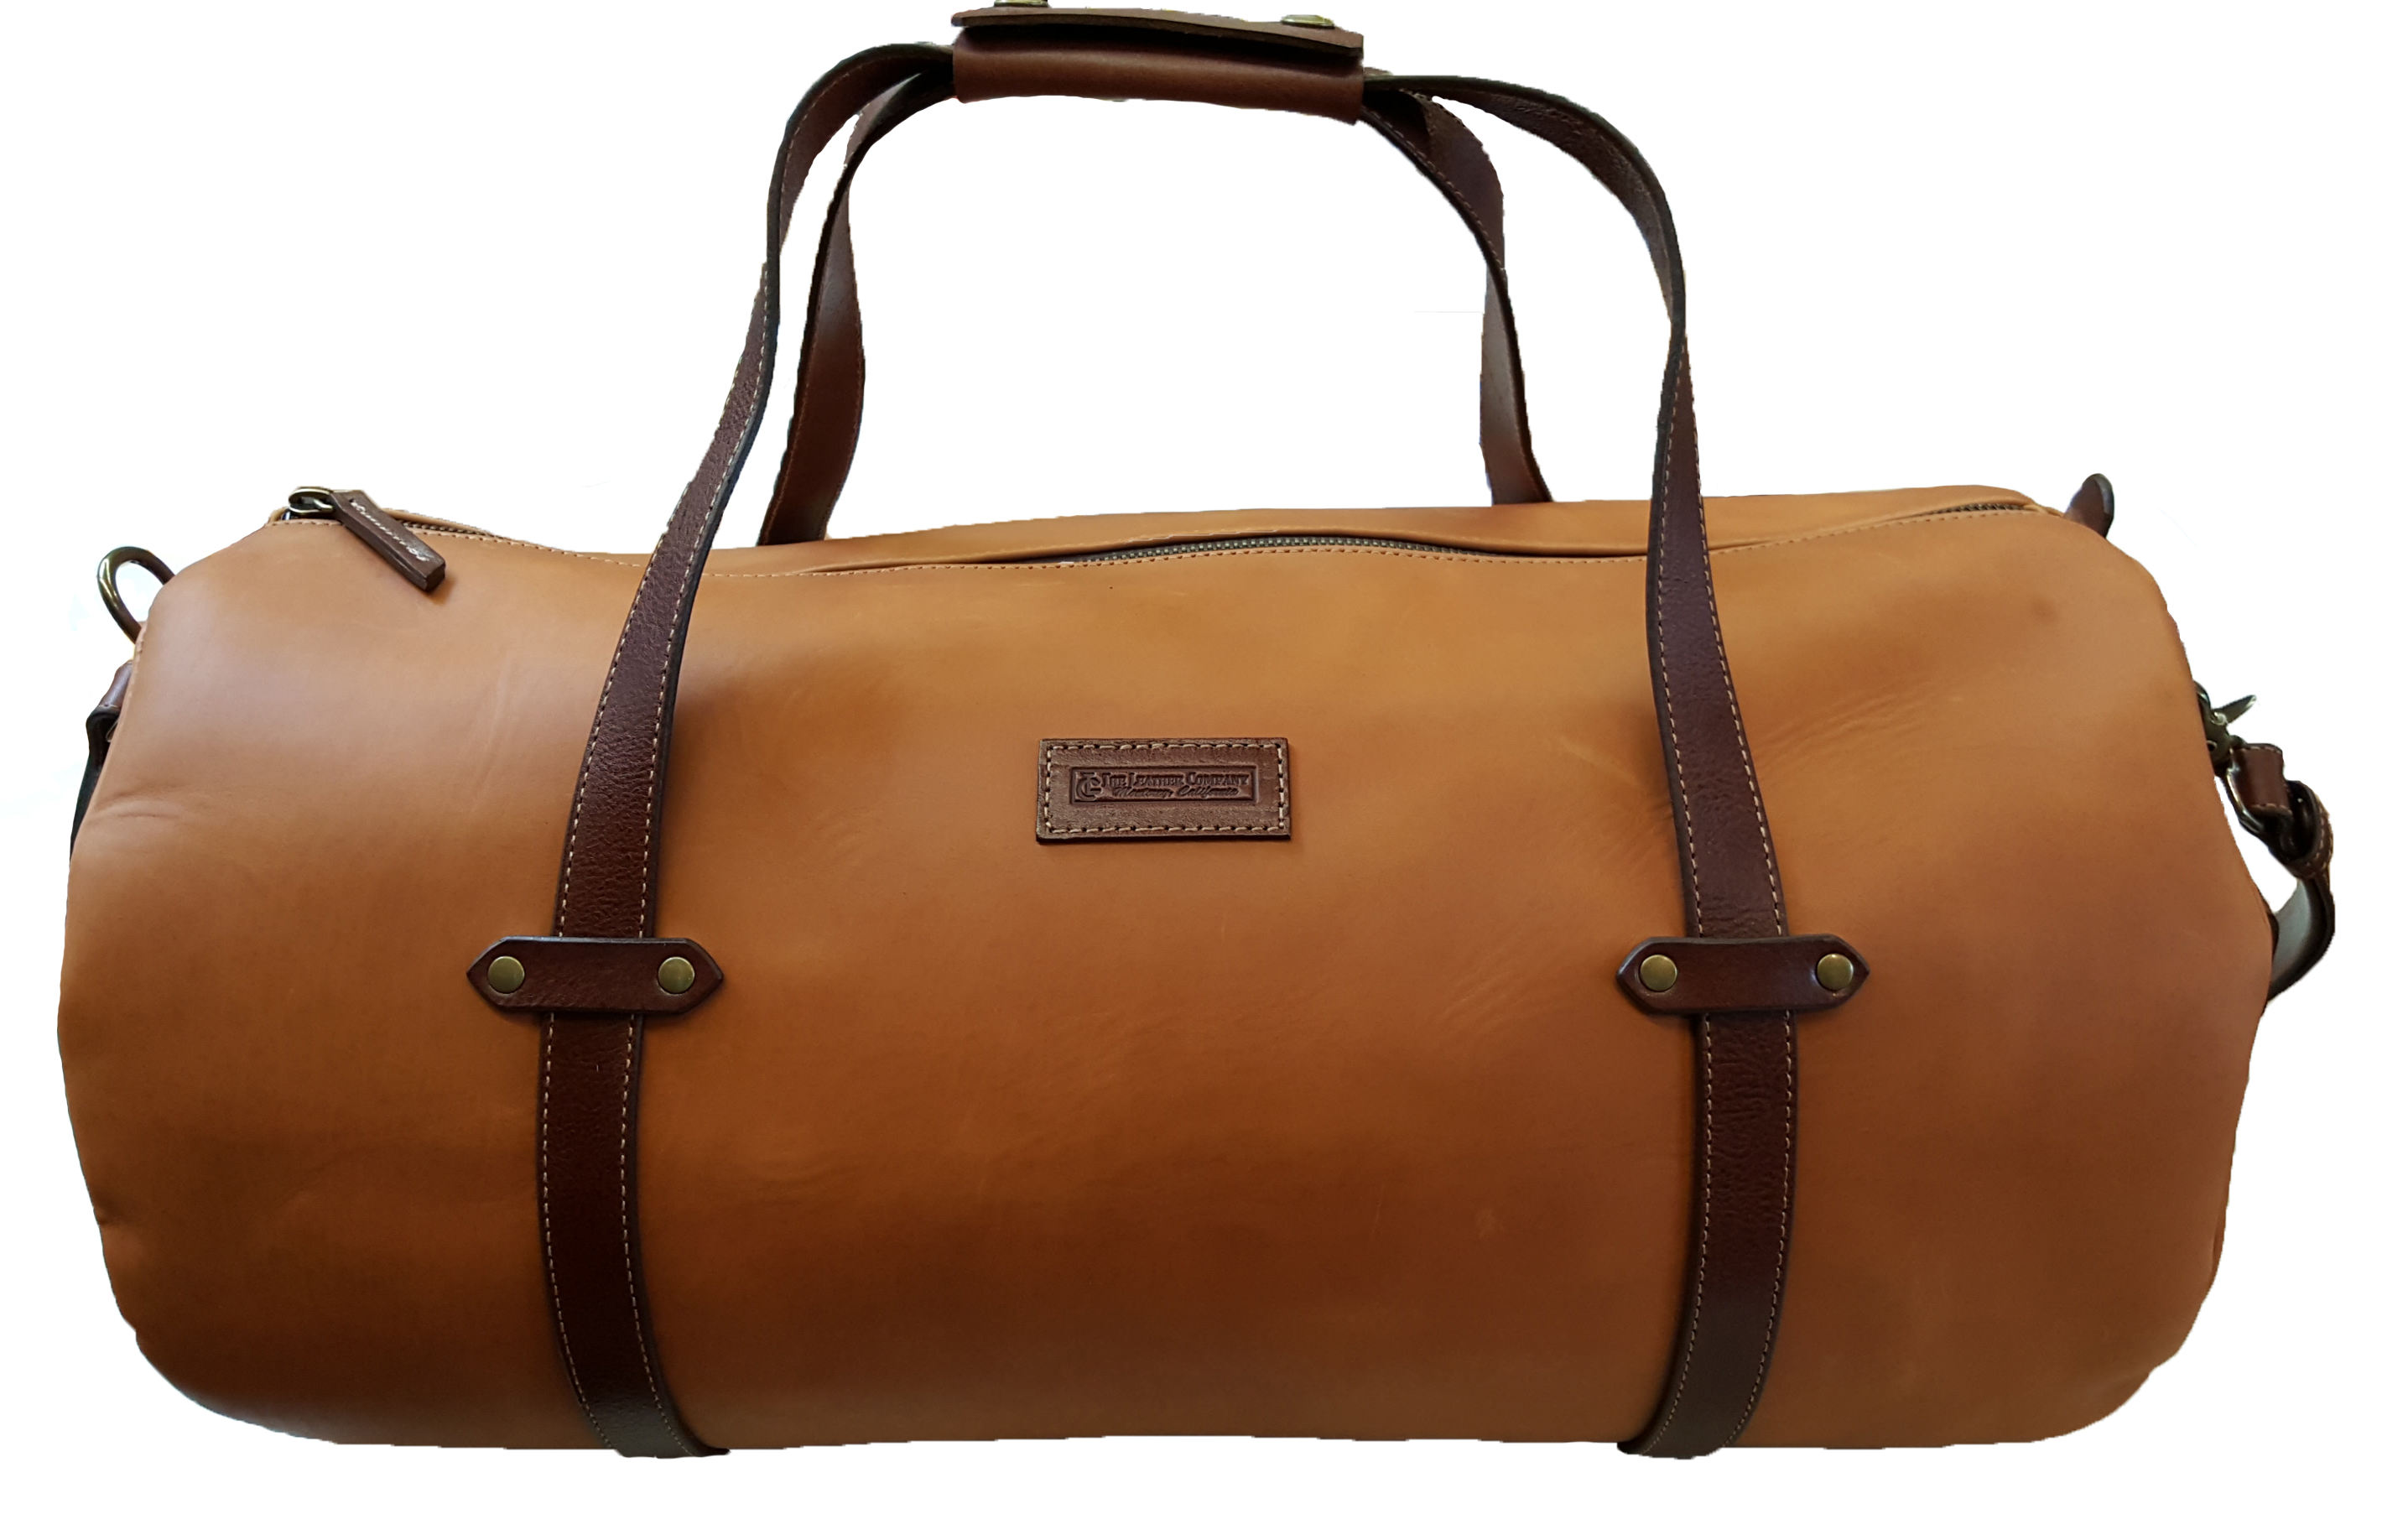 Gym Bag Leather Company